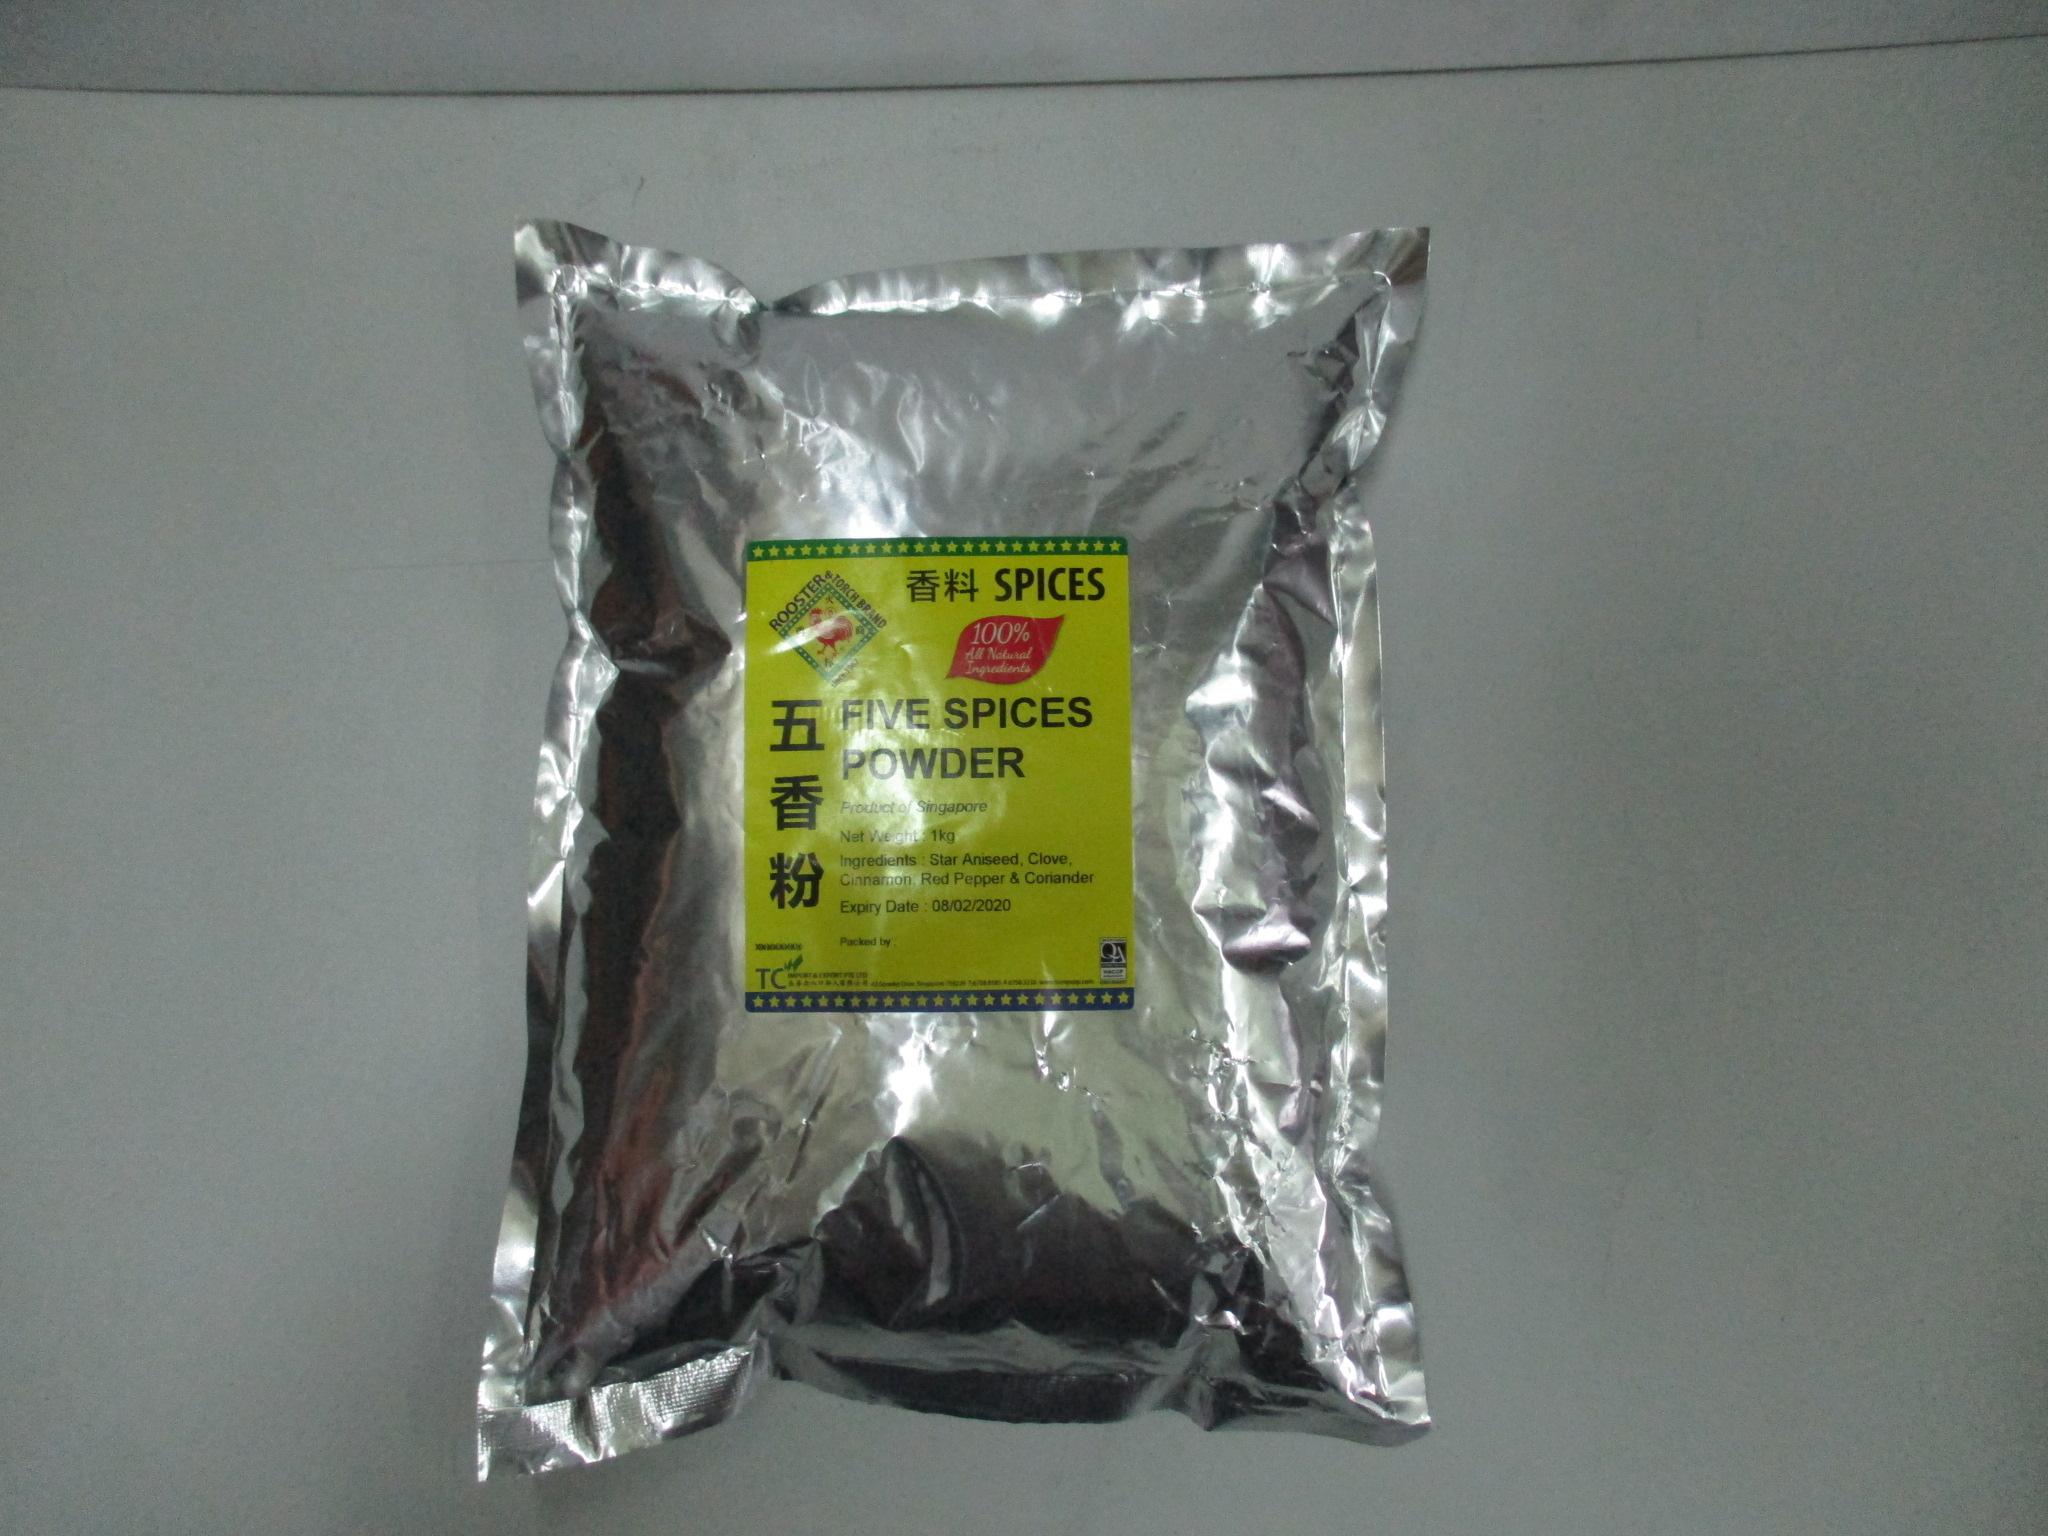 Five Spices Powder 1kg